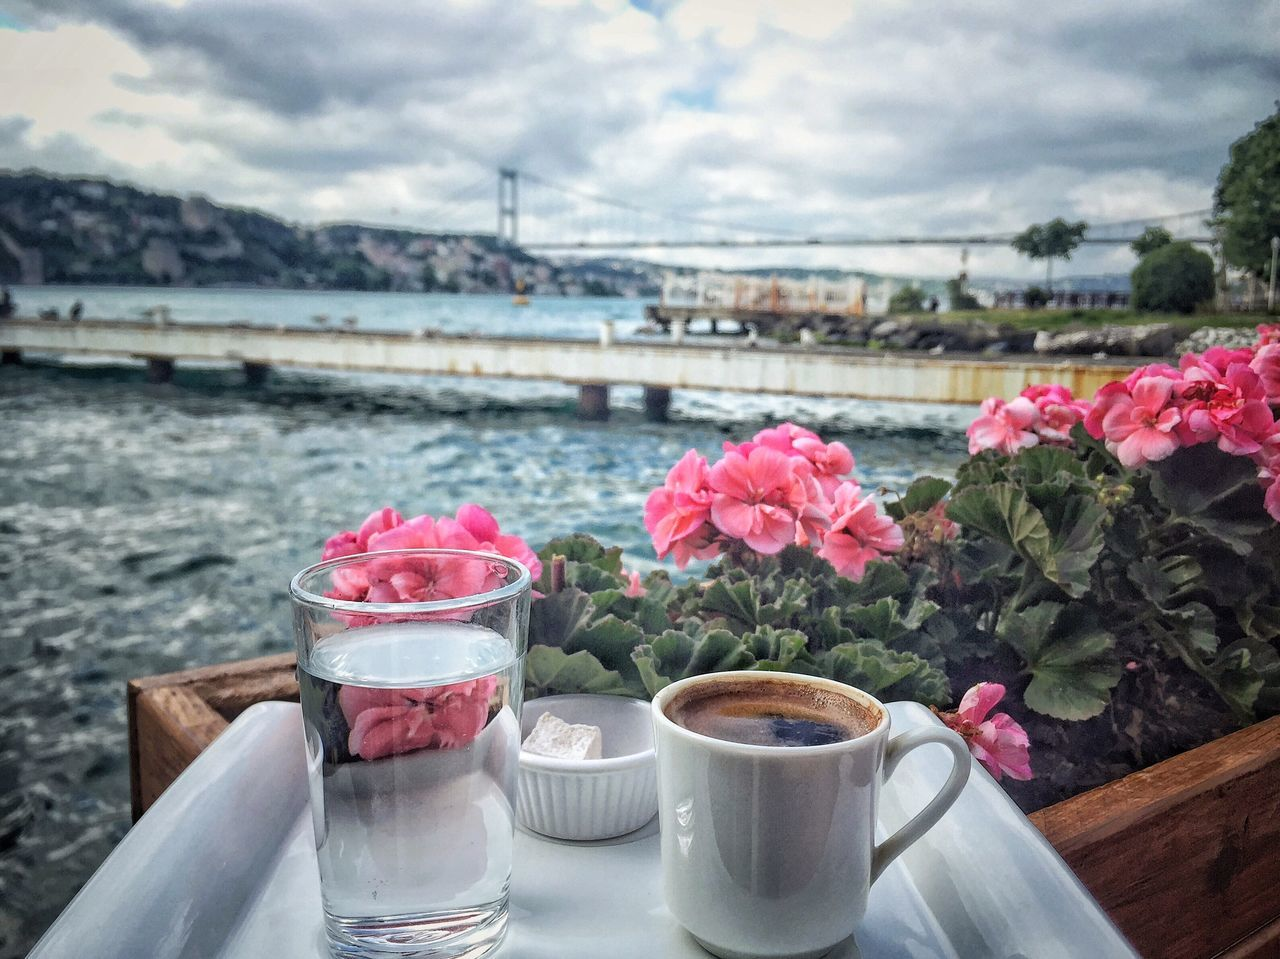 Bosphorus Bosporus Bridge Cafe Coffee Coffee Time Day Drinking Europe Flower Freshness Istanbul No People Nobody Pink Plant Seaside Sky Spring Traveling Turkey Turkish Turkish Coffee Turkish Delight Water